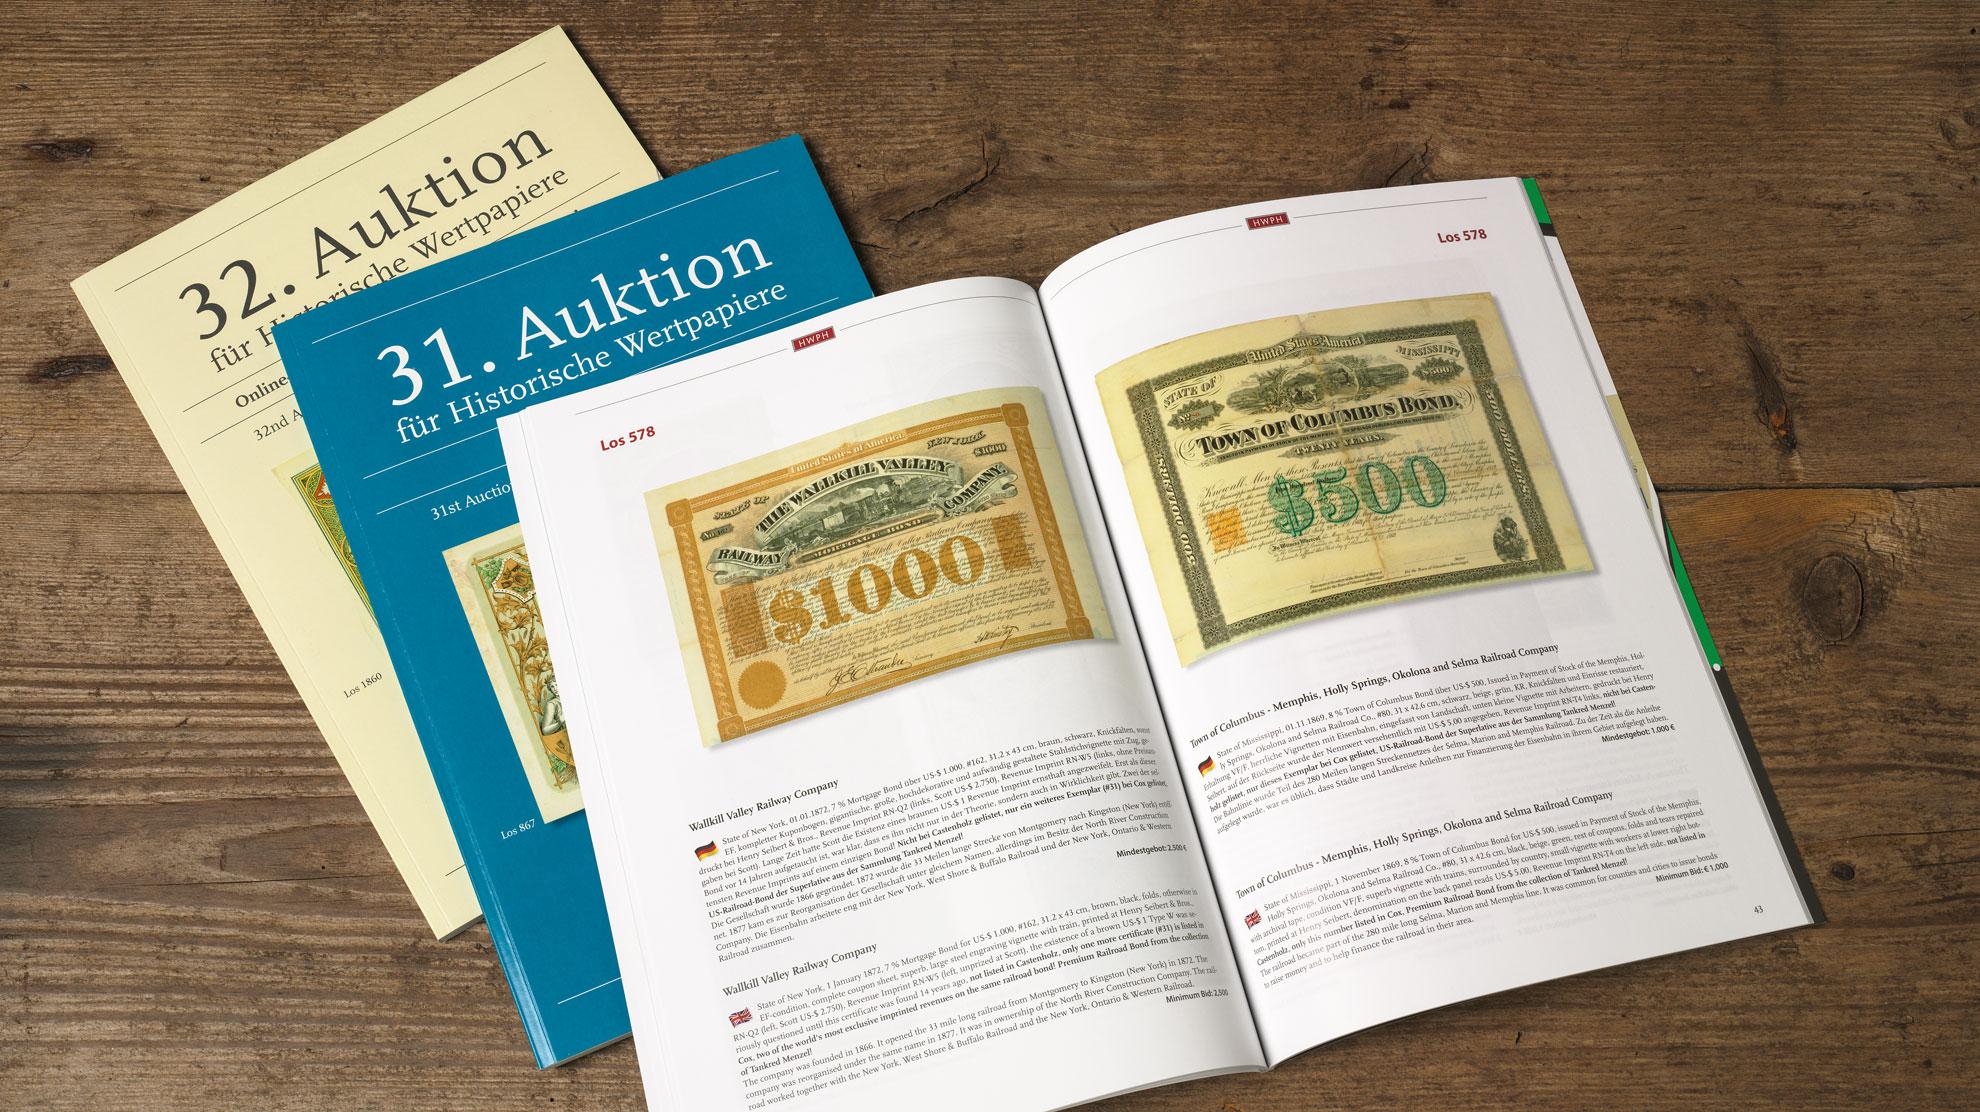 punktneun-HWPH-Auktionskataloge-01